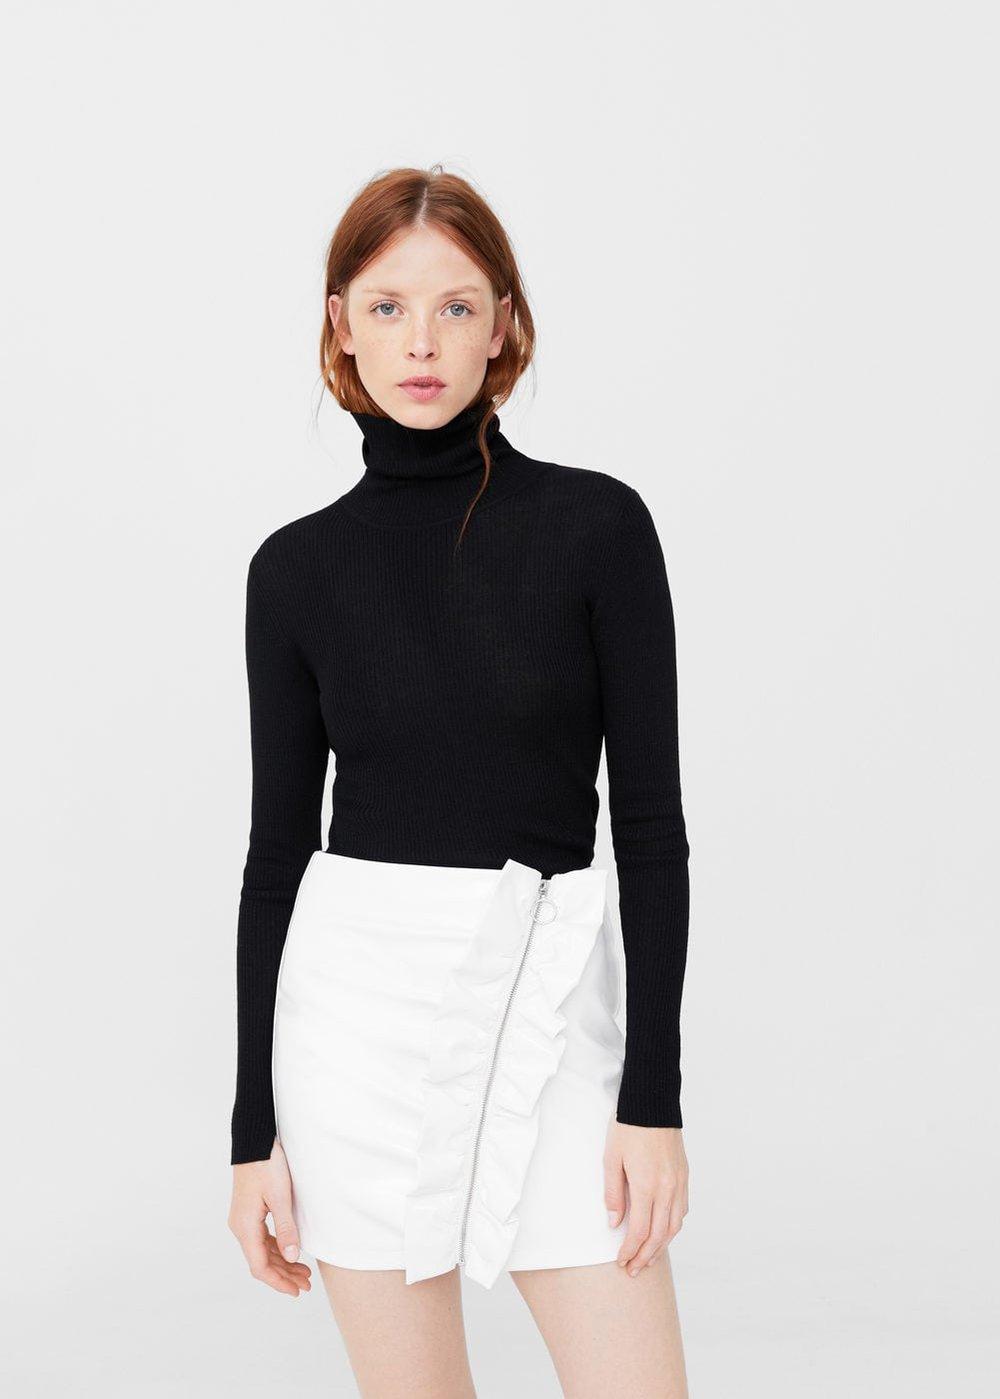 Skirt by Mango - £19.99